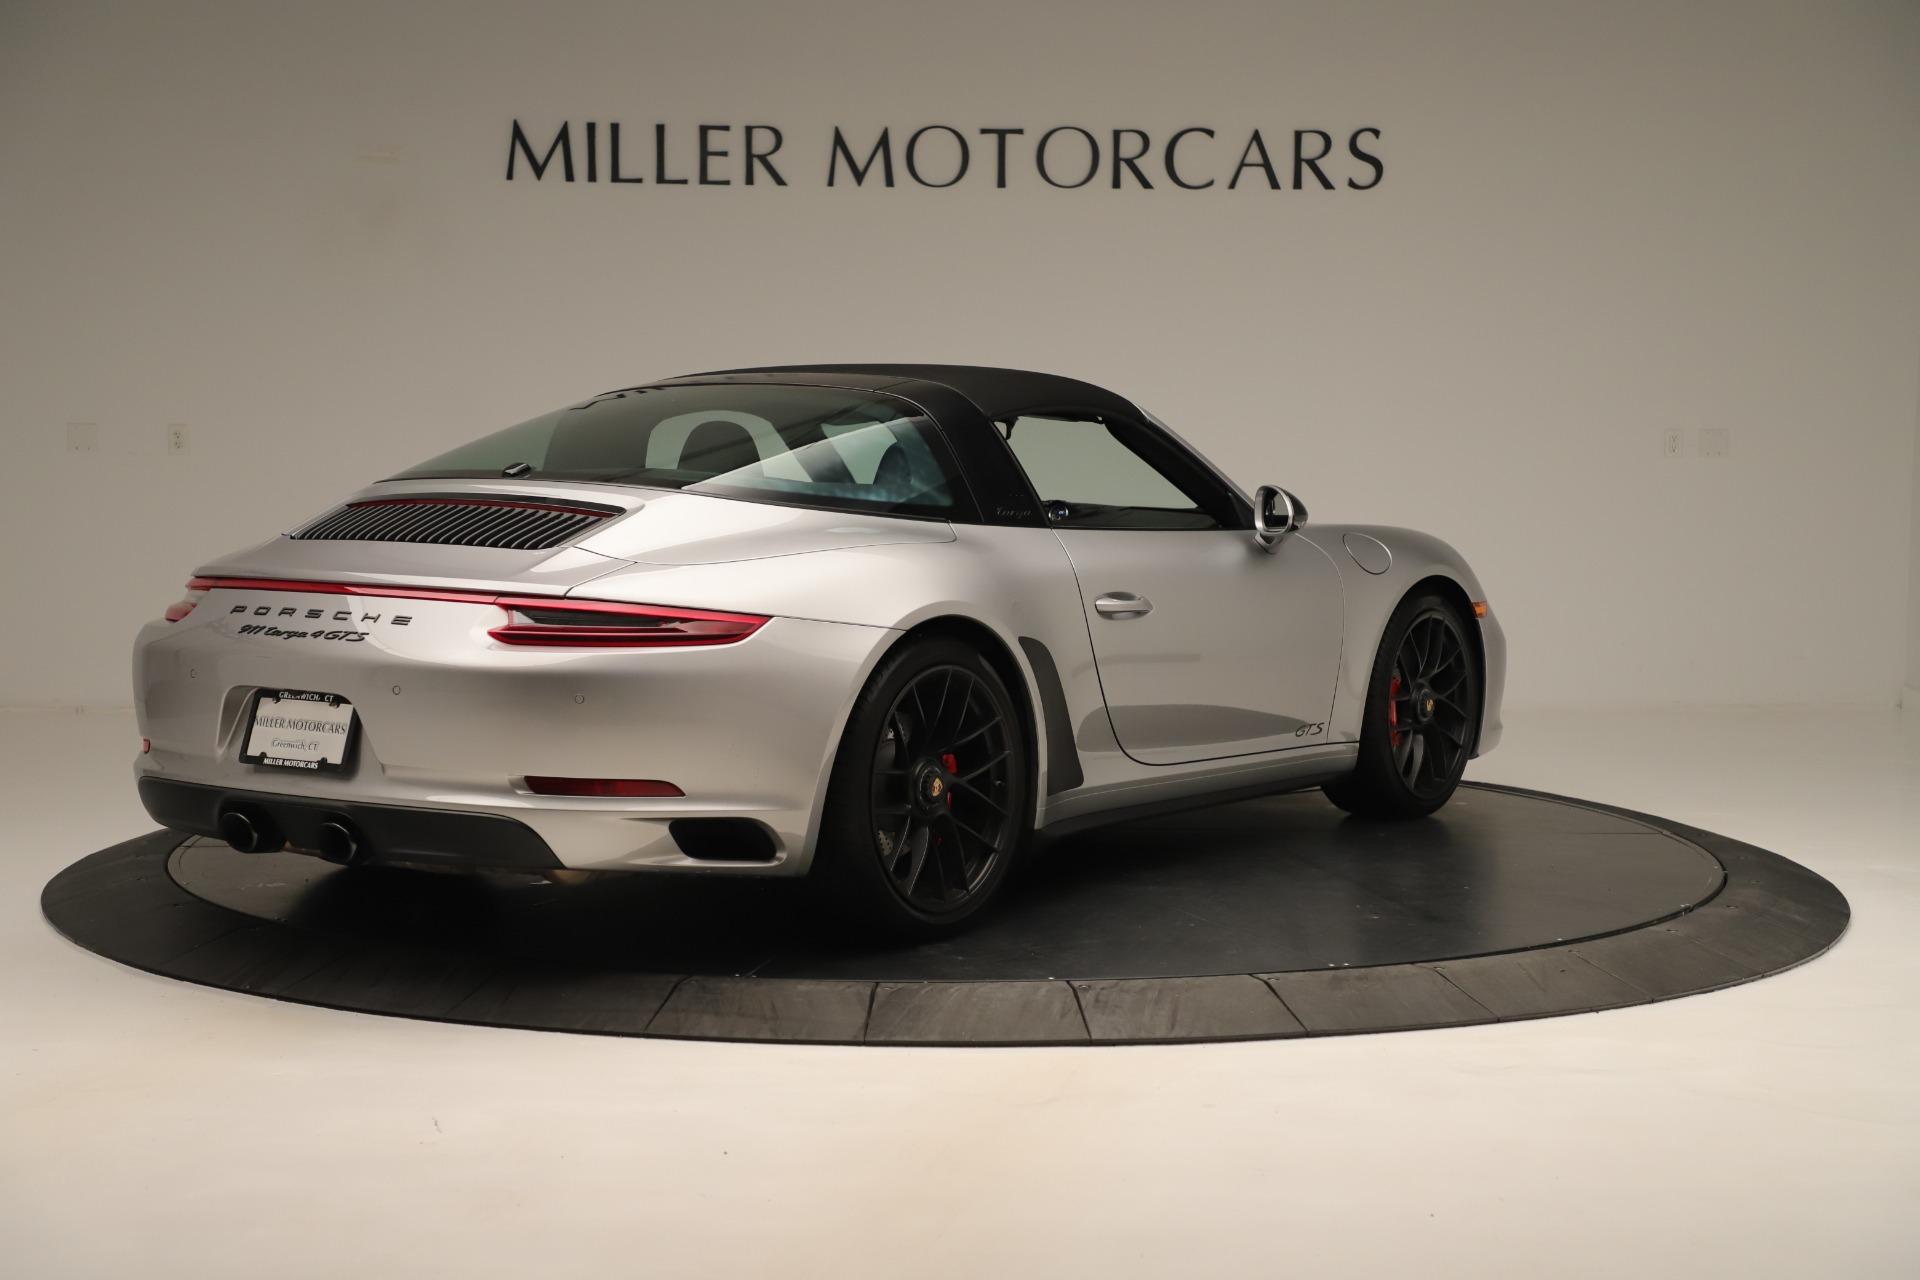 Used 2017 Porsche 911 Targa 4 GTS For Sale In Greenwich, CT 3374_p14